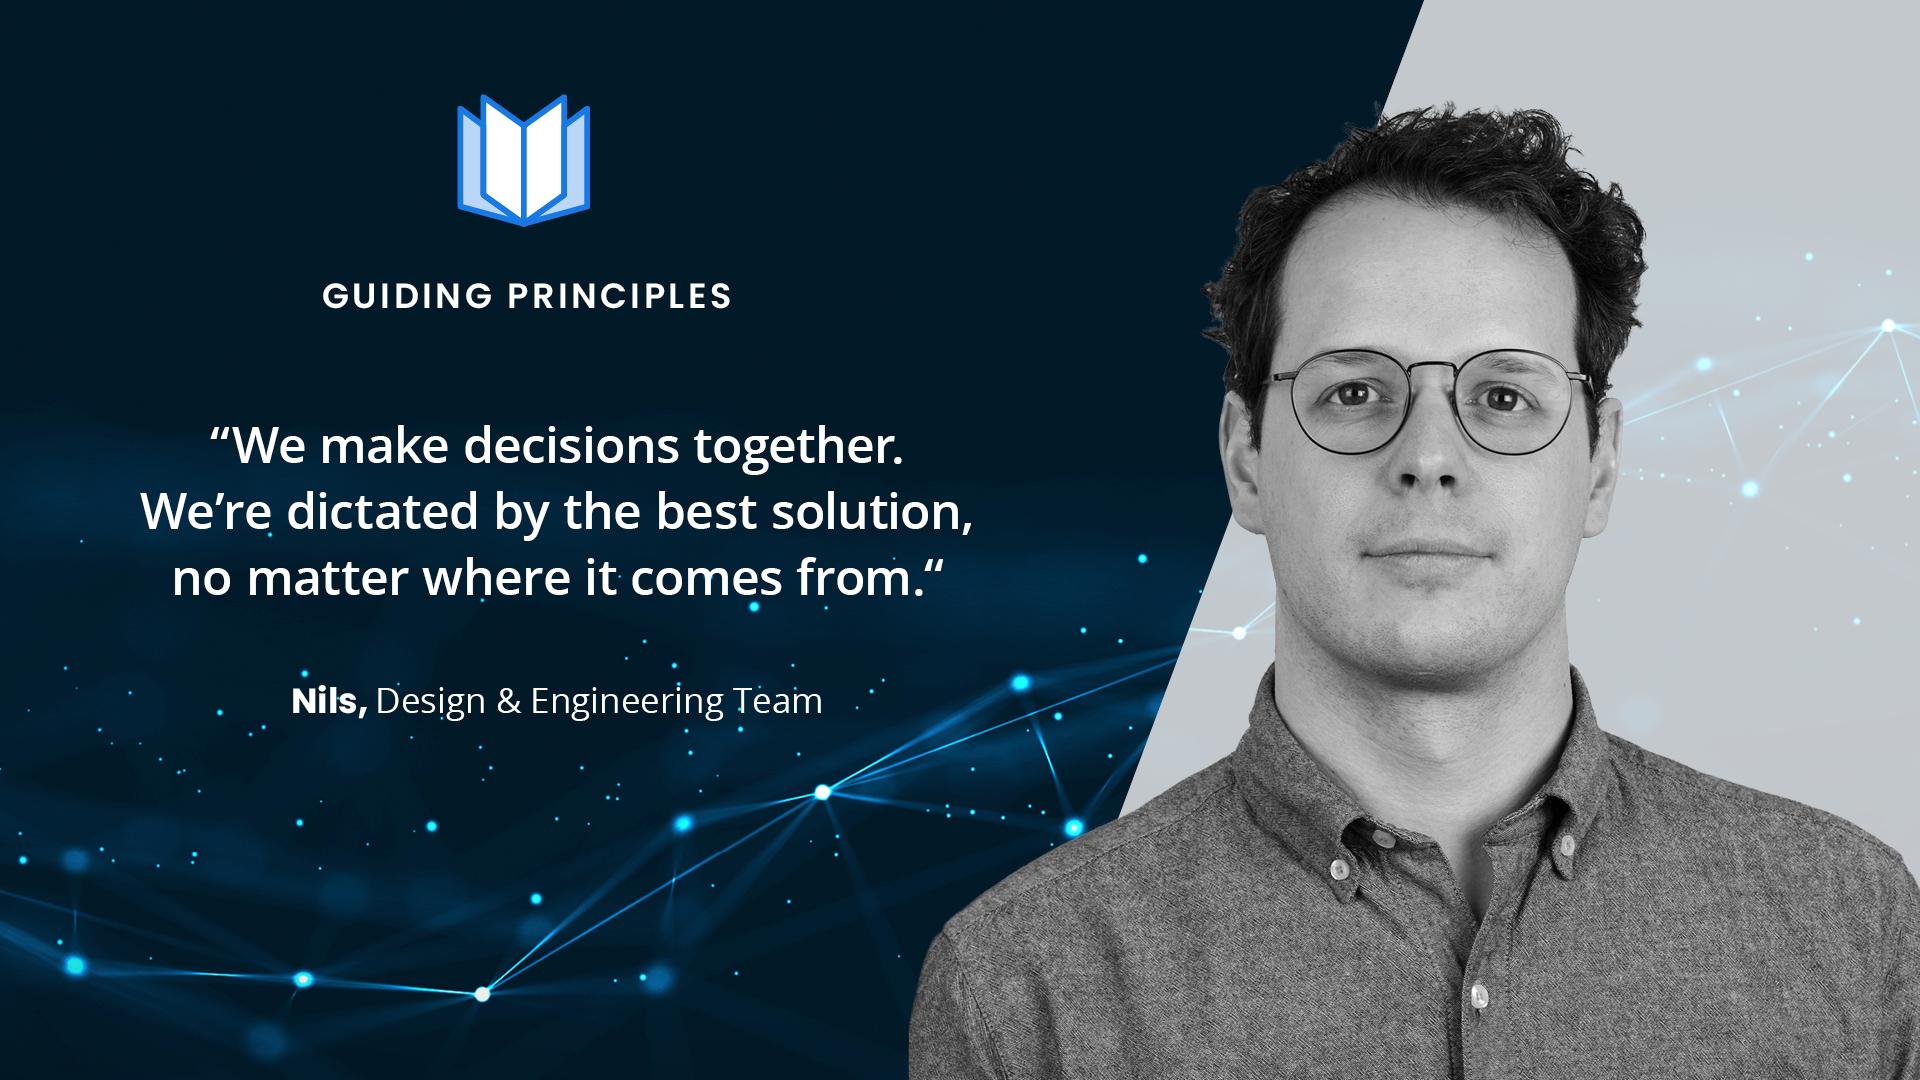 Guiding_Principles_Blog-post_2nd-round-Nils